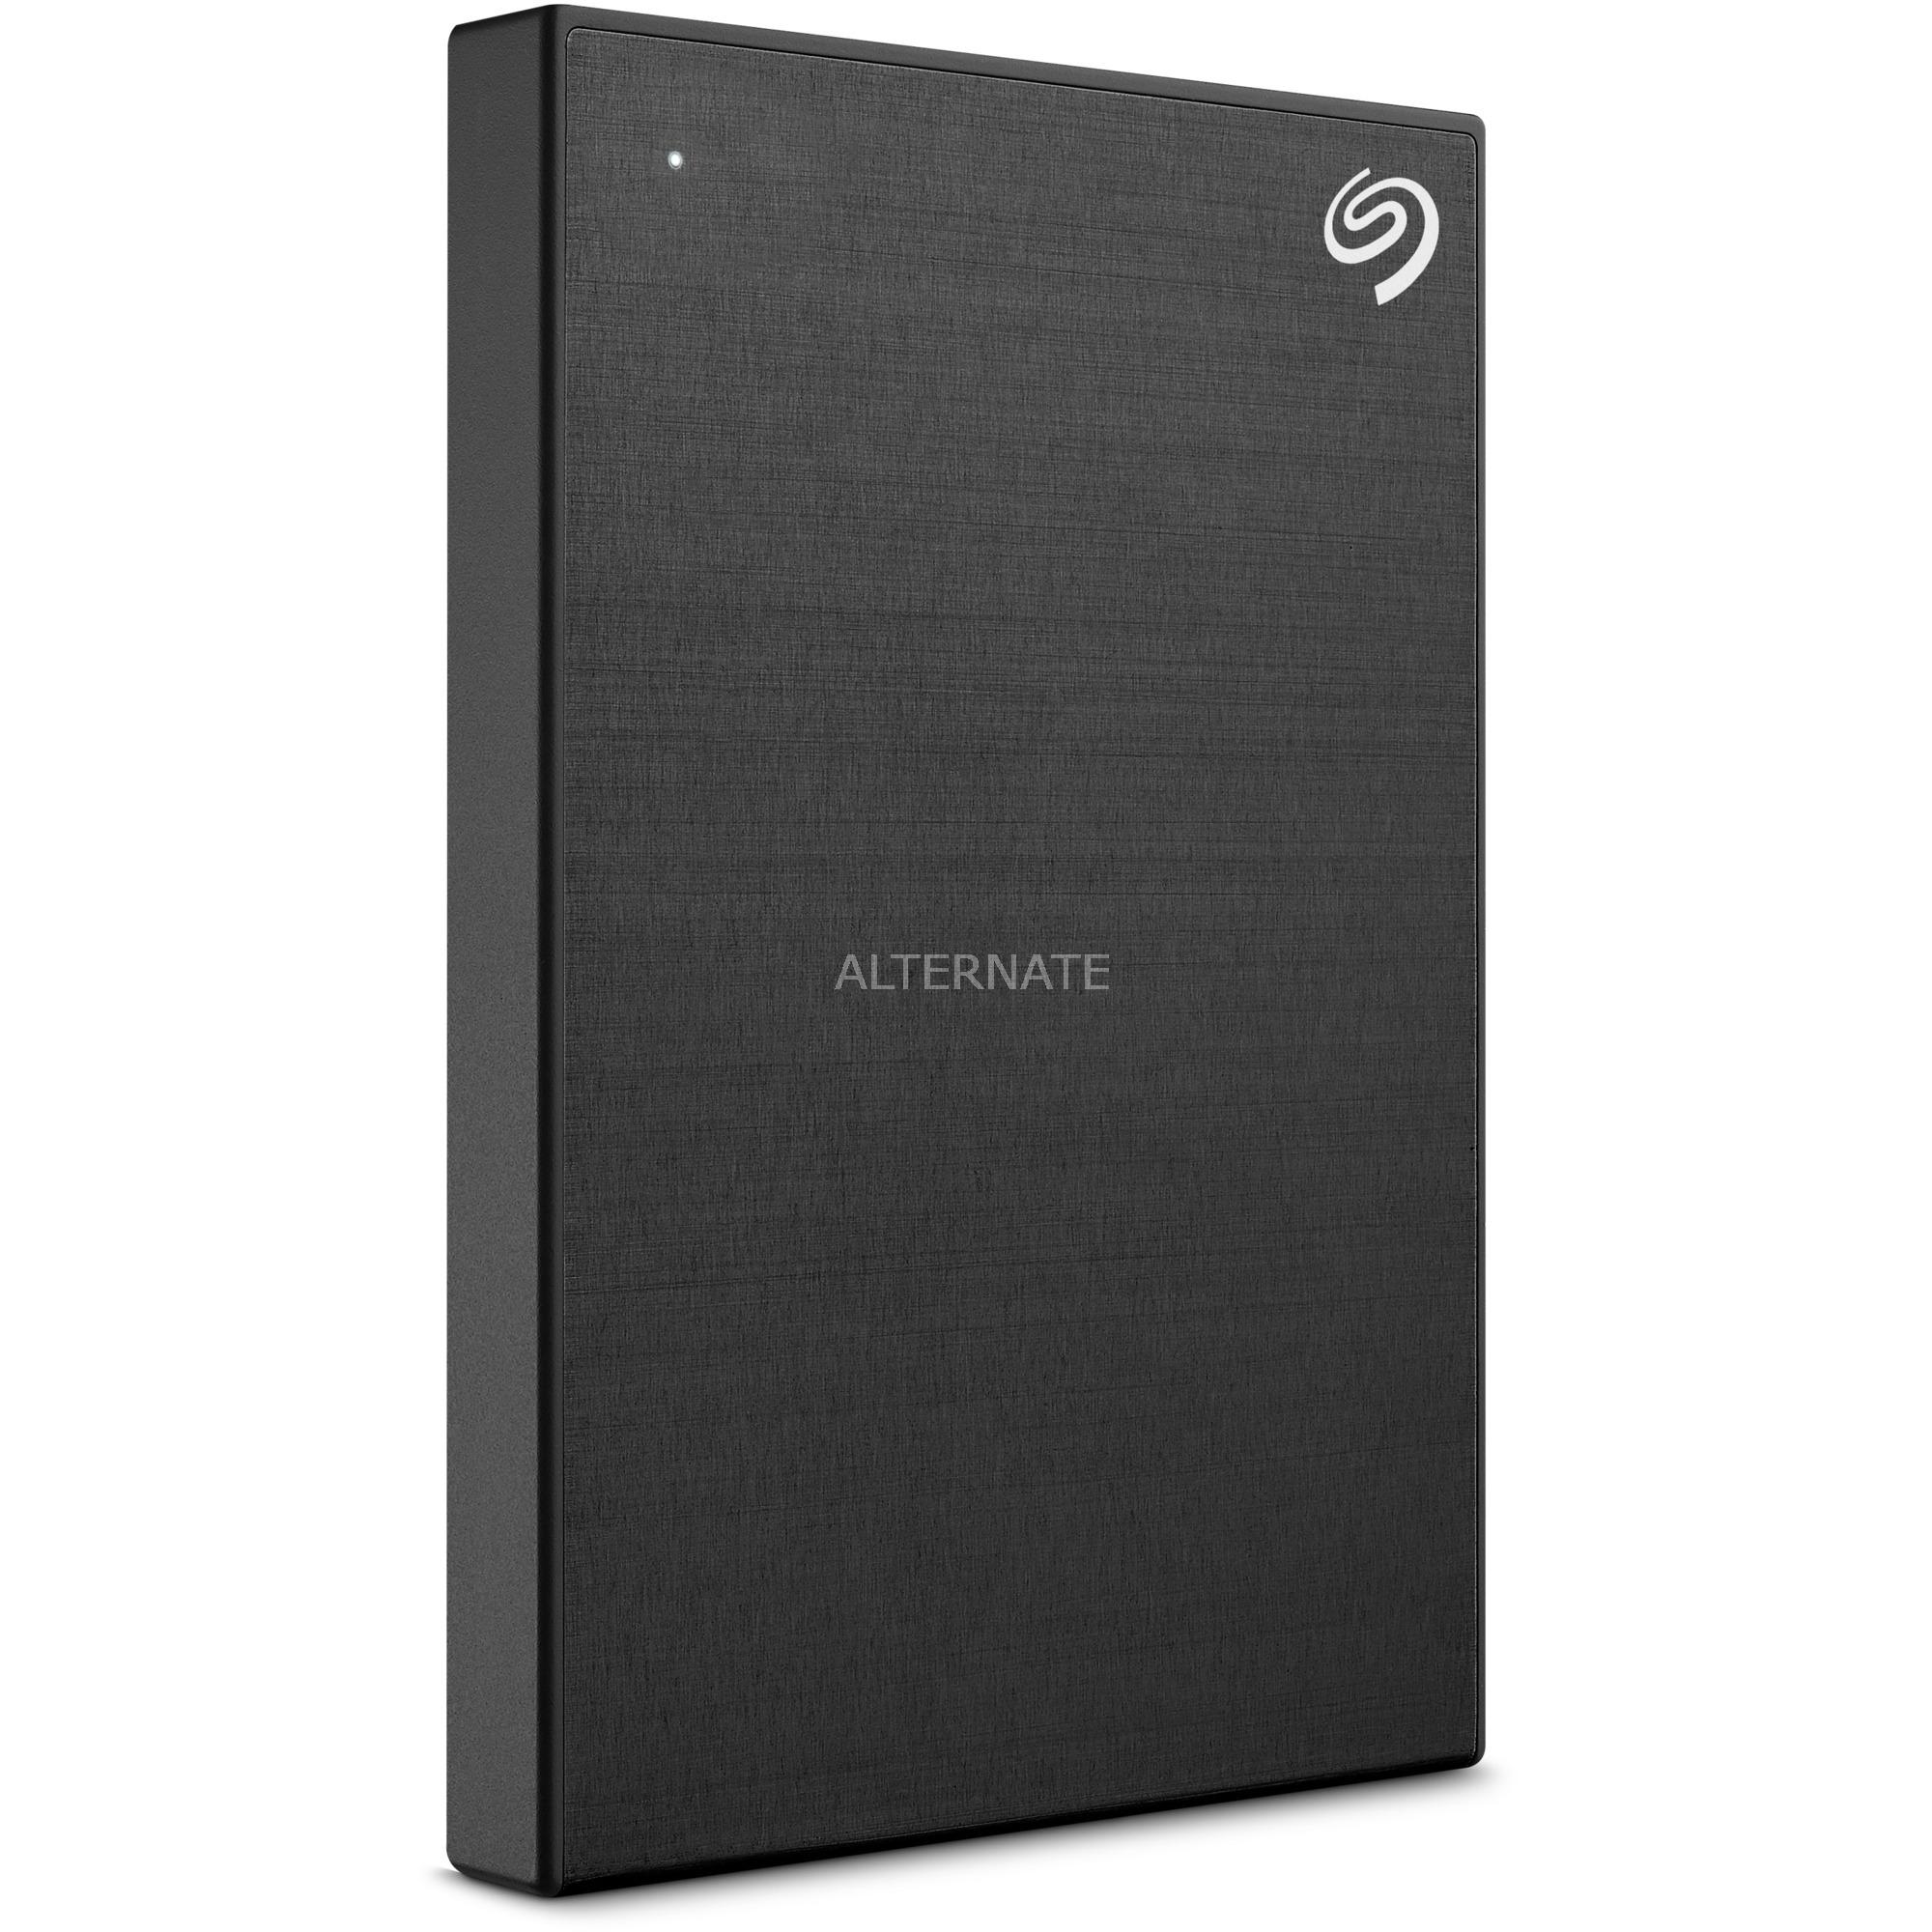 Backup Plus STHN1000400 disco duro externo 1000 GB Negro, Unidad de disco duro